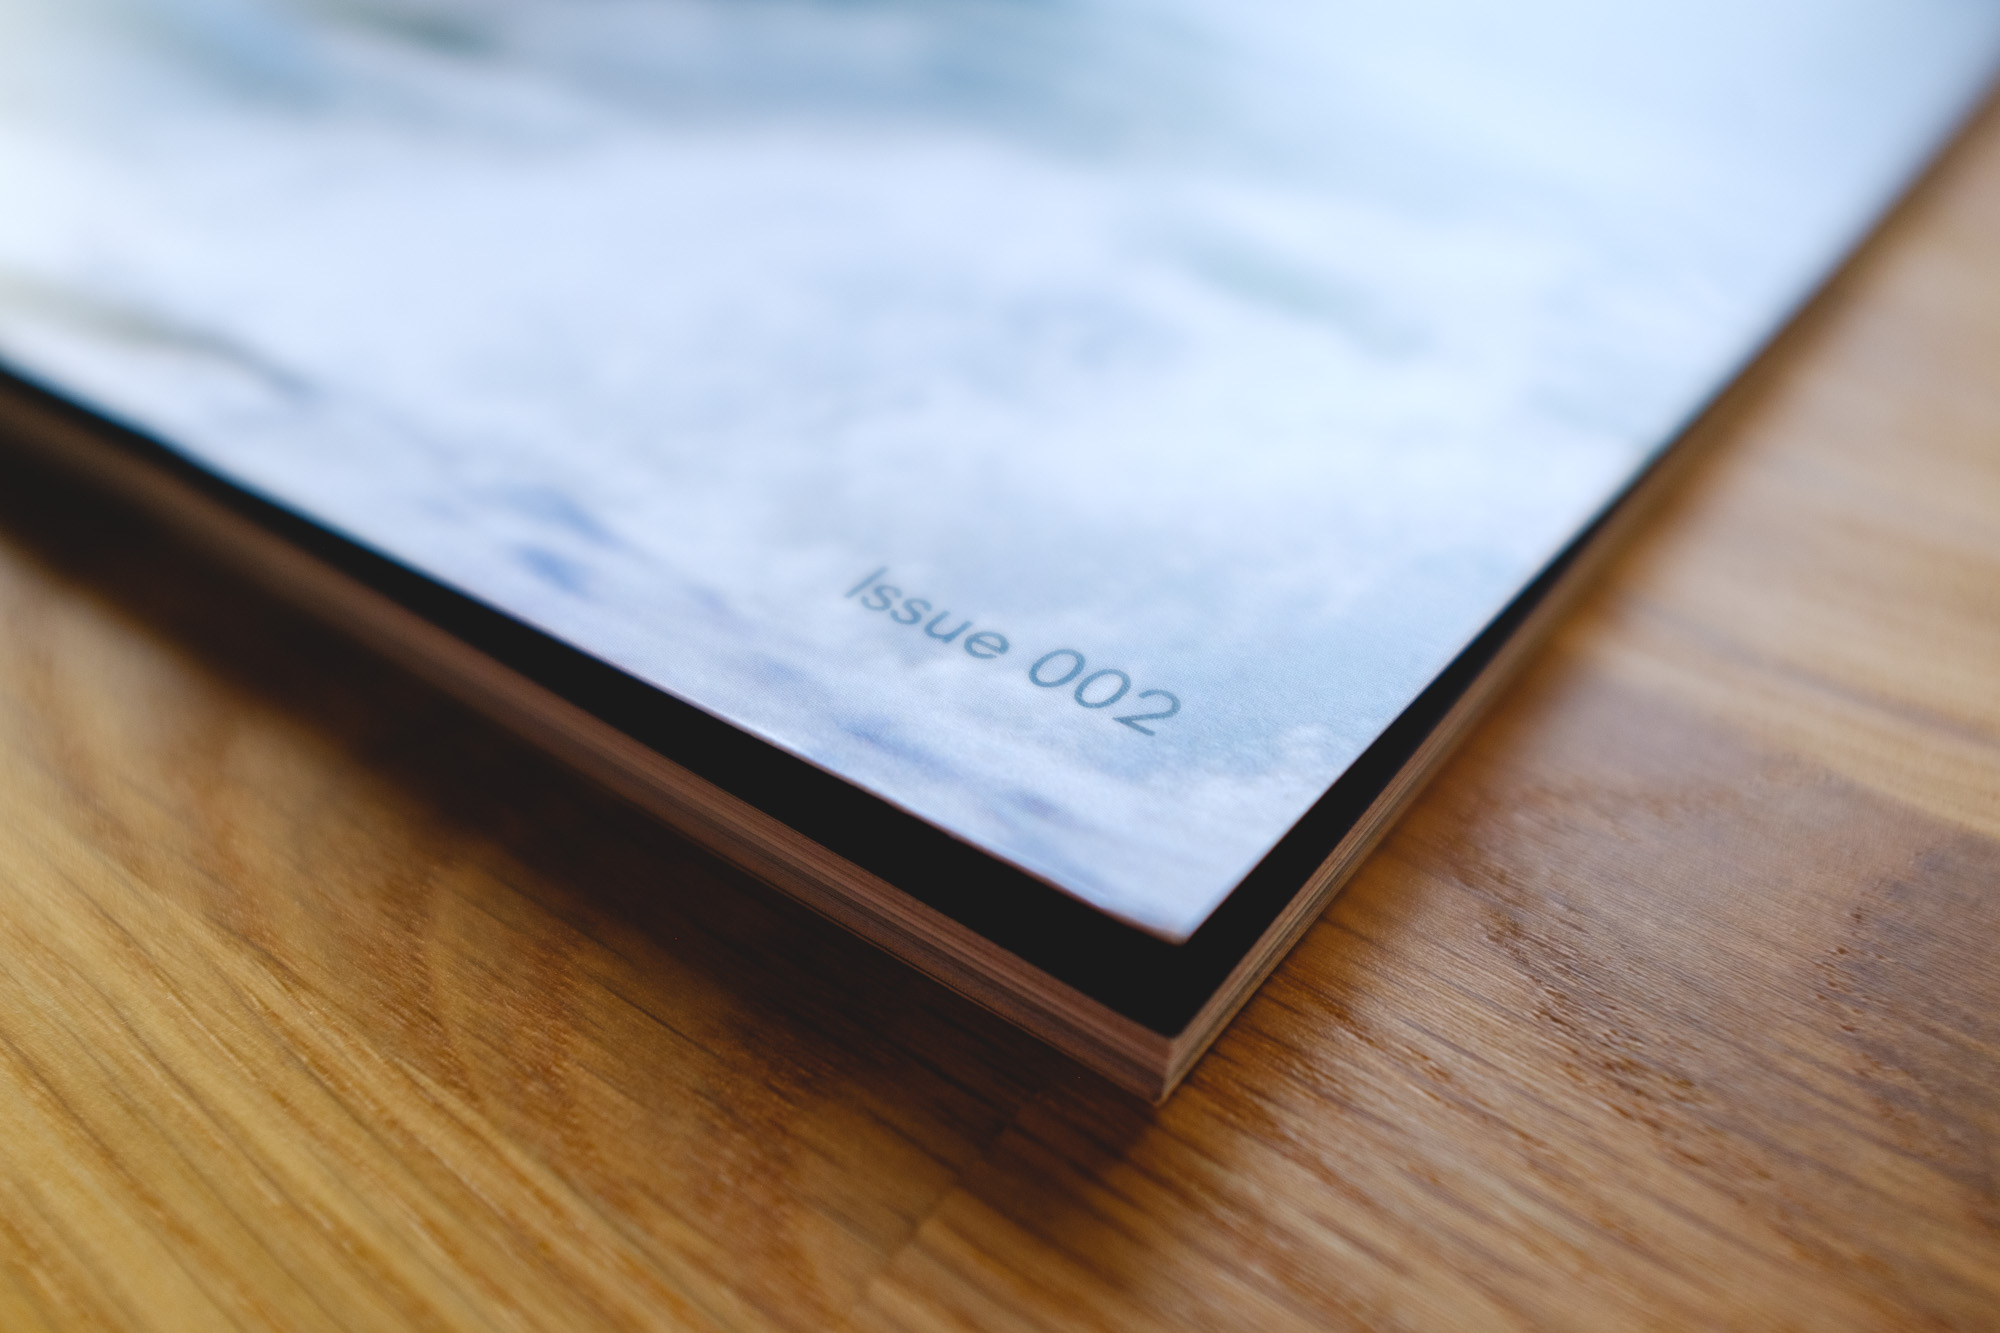 DSCF8715_sea-together-issue-002_20190601.jpg